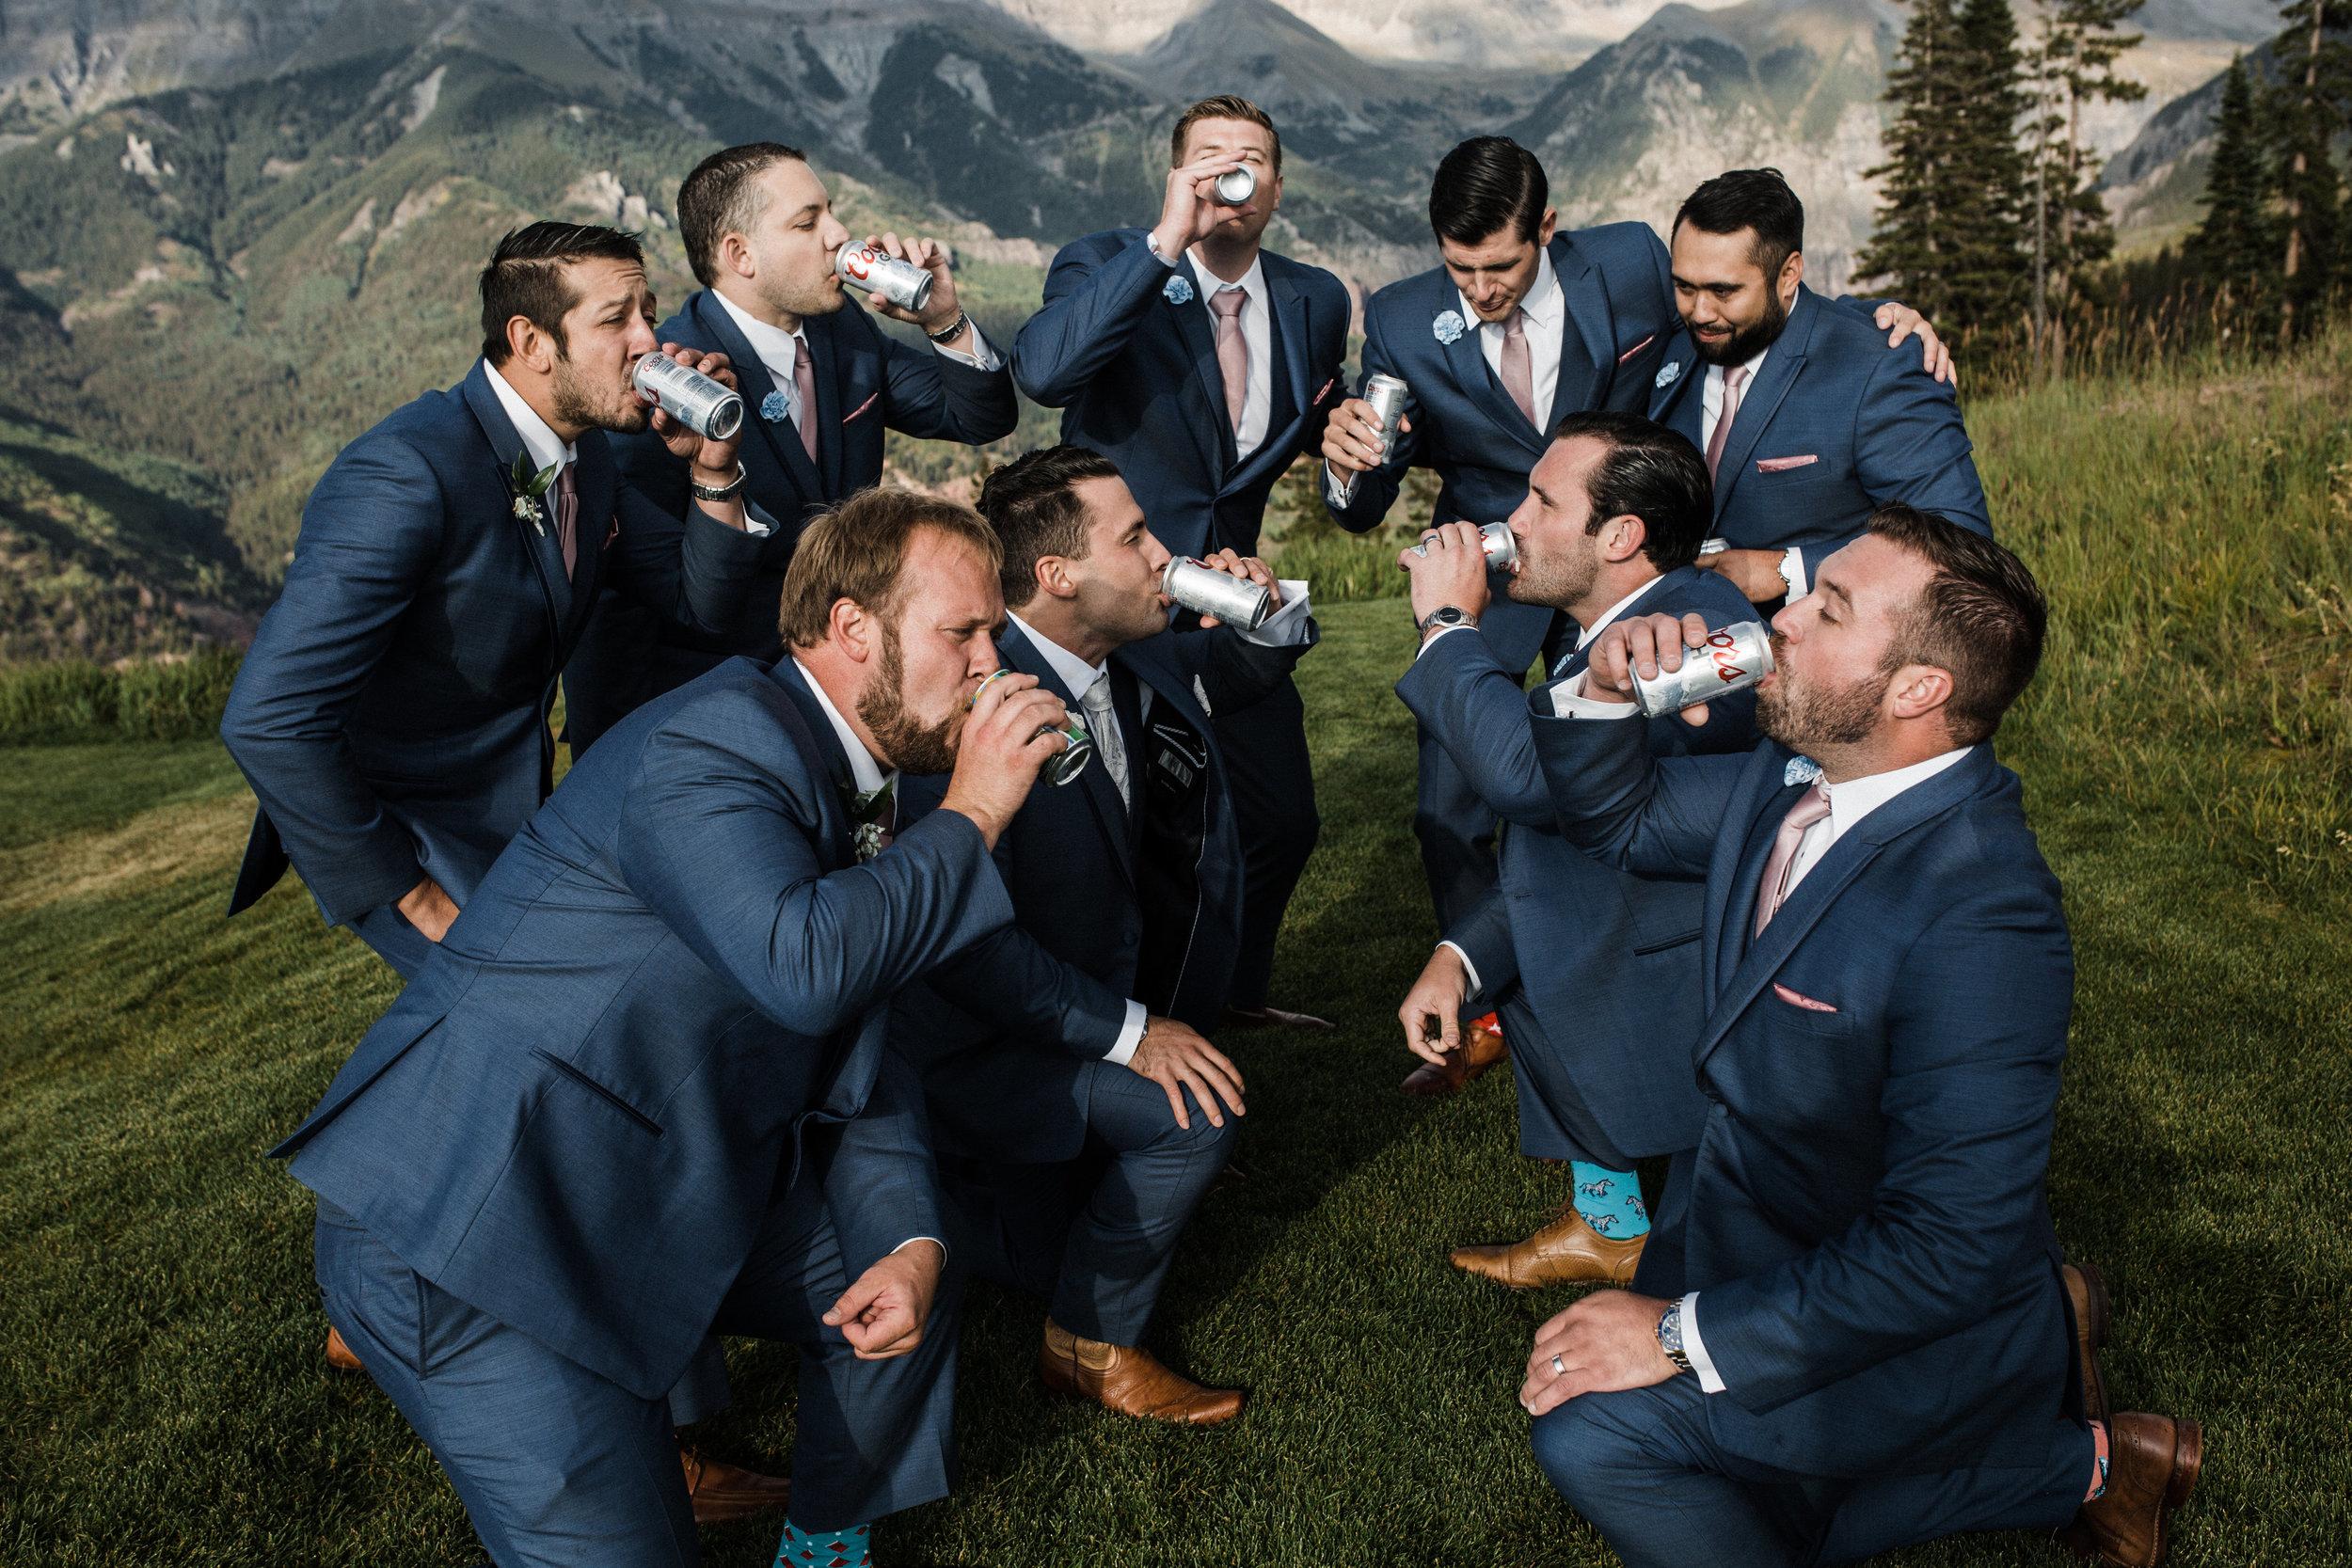 leahandashton-telluride-wedding-photography-0068.jpg